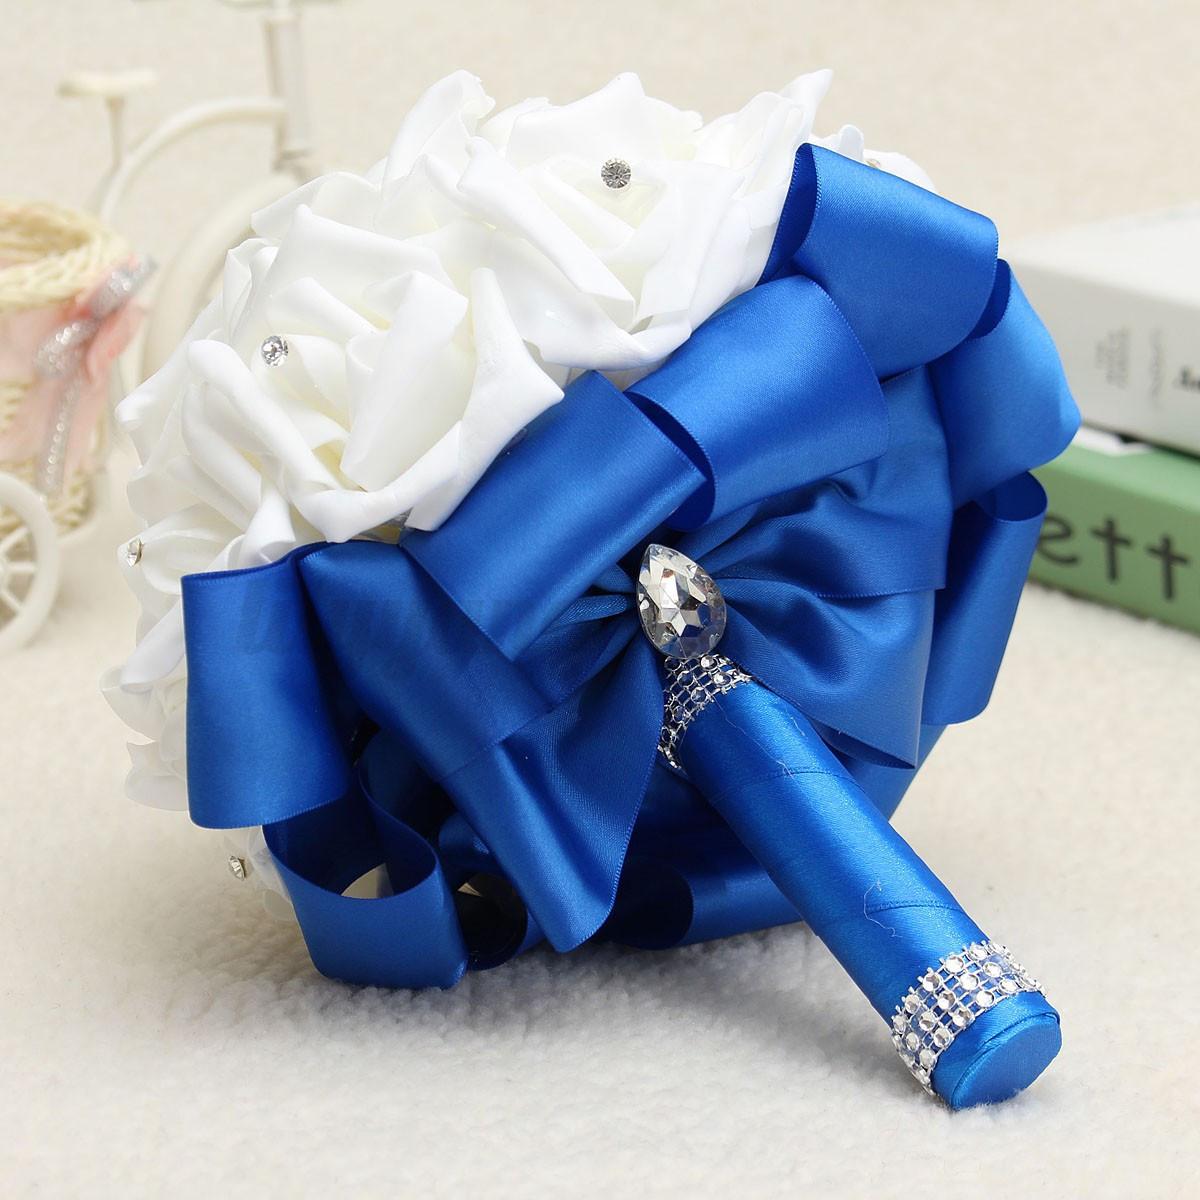 Ramo-de-Novia-Flor-Boda-Artificial-Rosa-Wedding-Bouquet-Bridesmaid-Decoracion